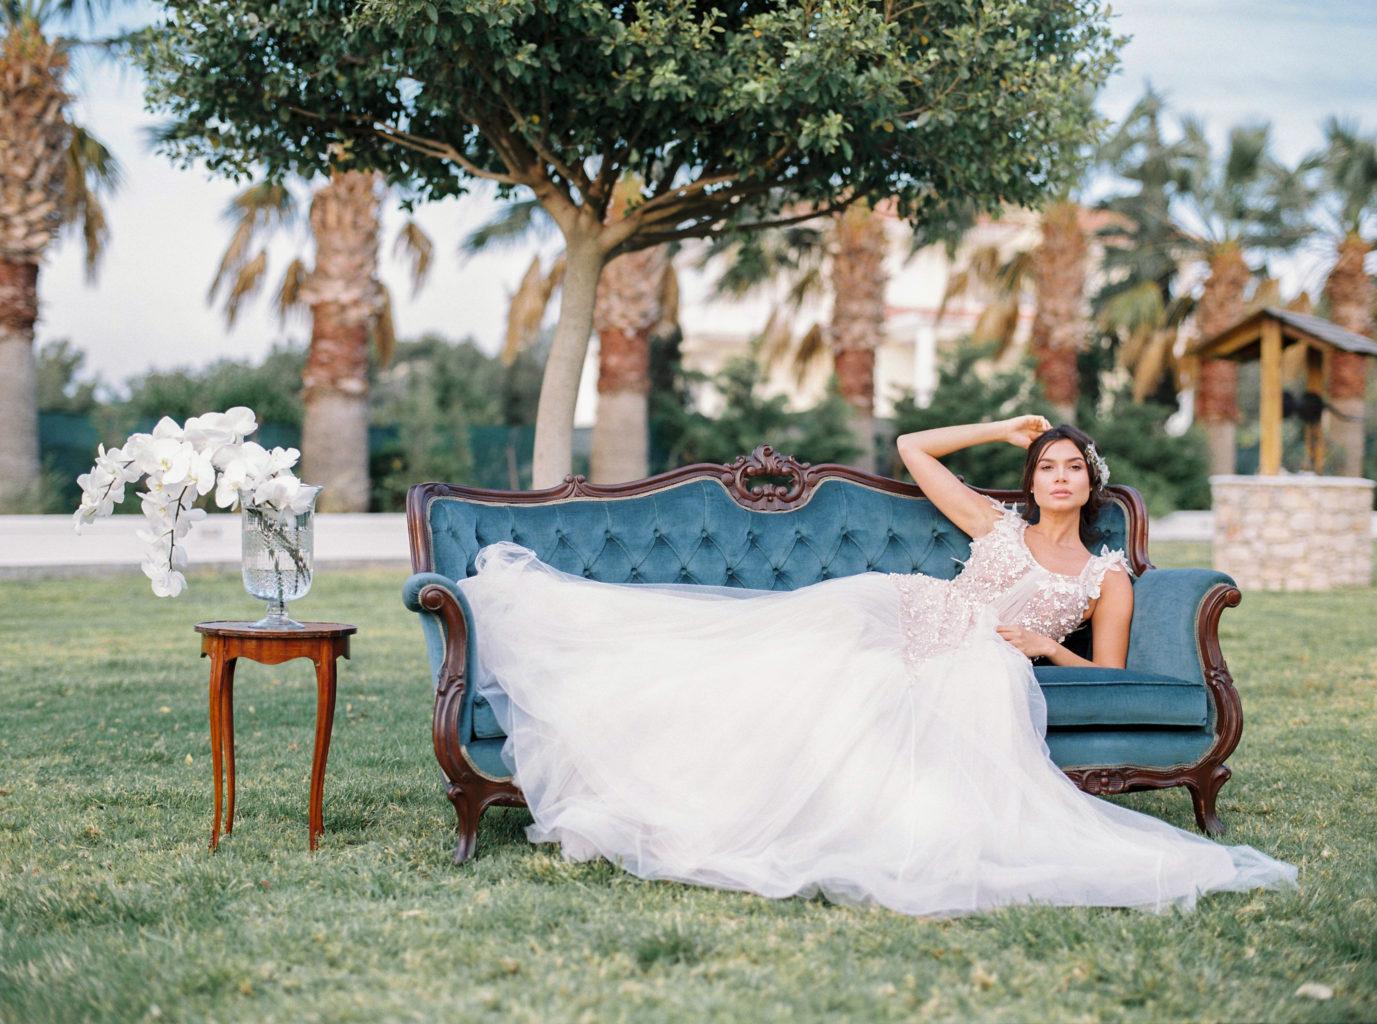 A Quick Guide to Book a Destination Wedding Photographer